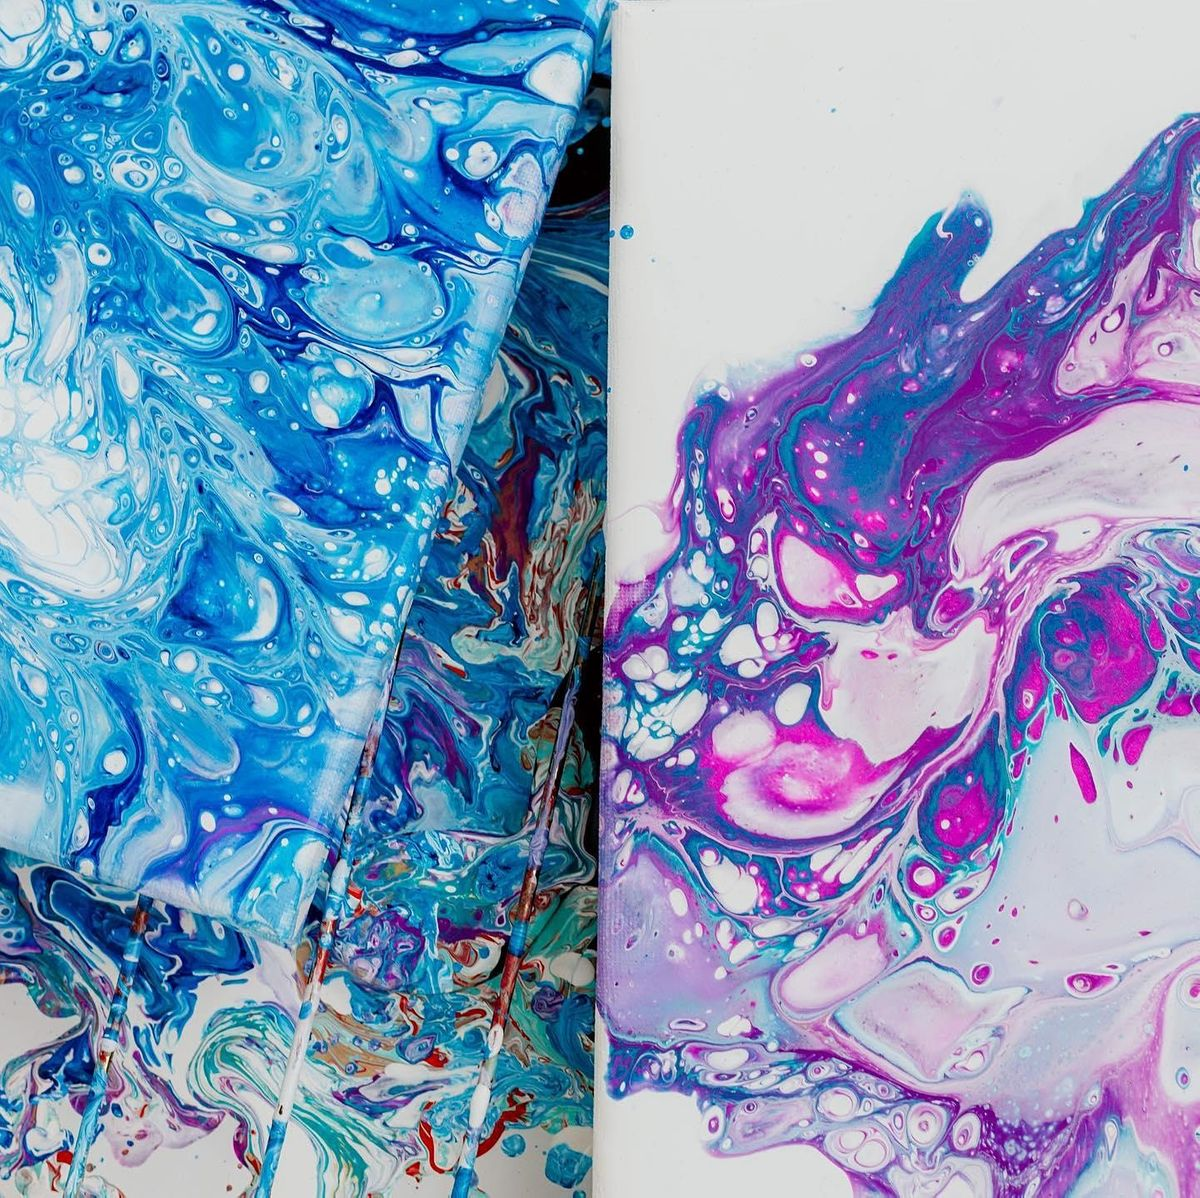 Fluid Art Workshop by the ocean